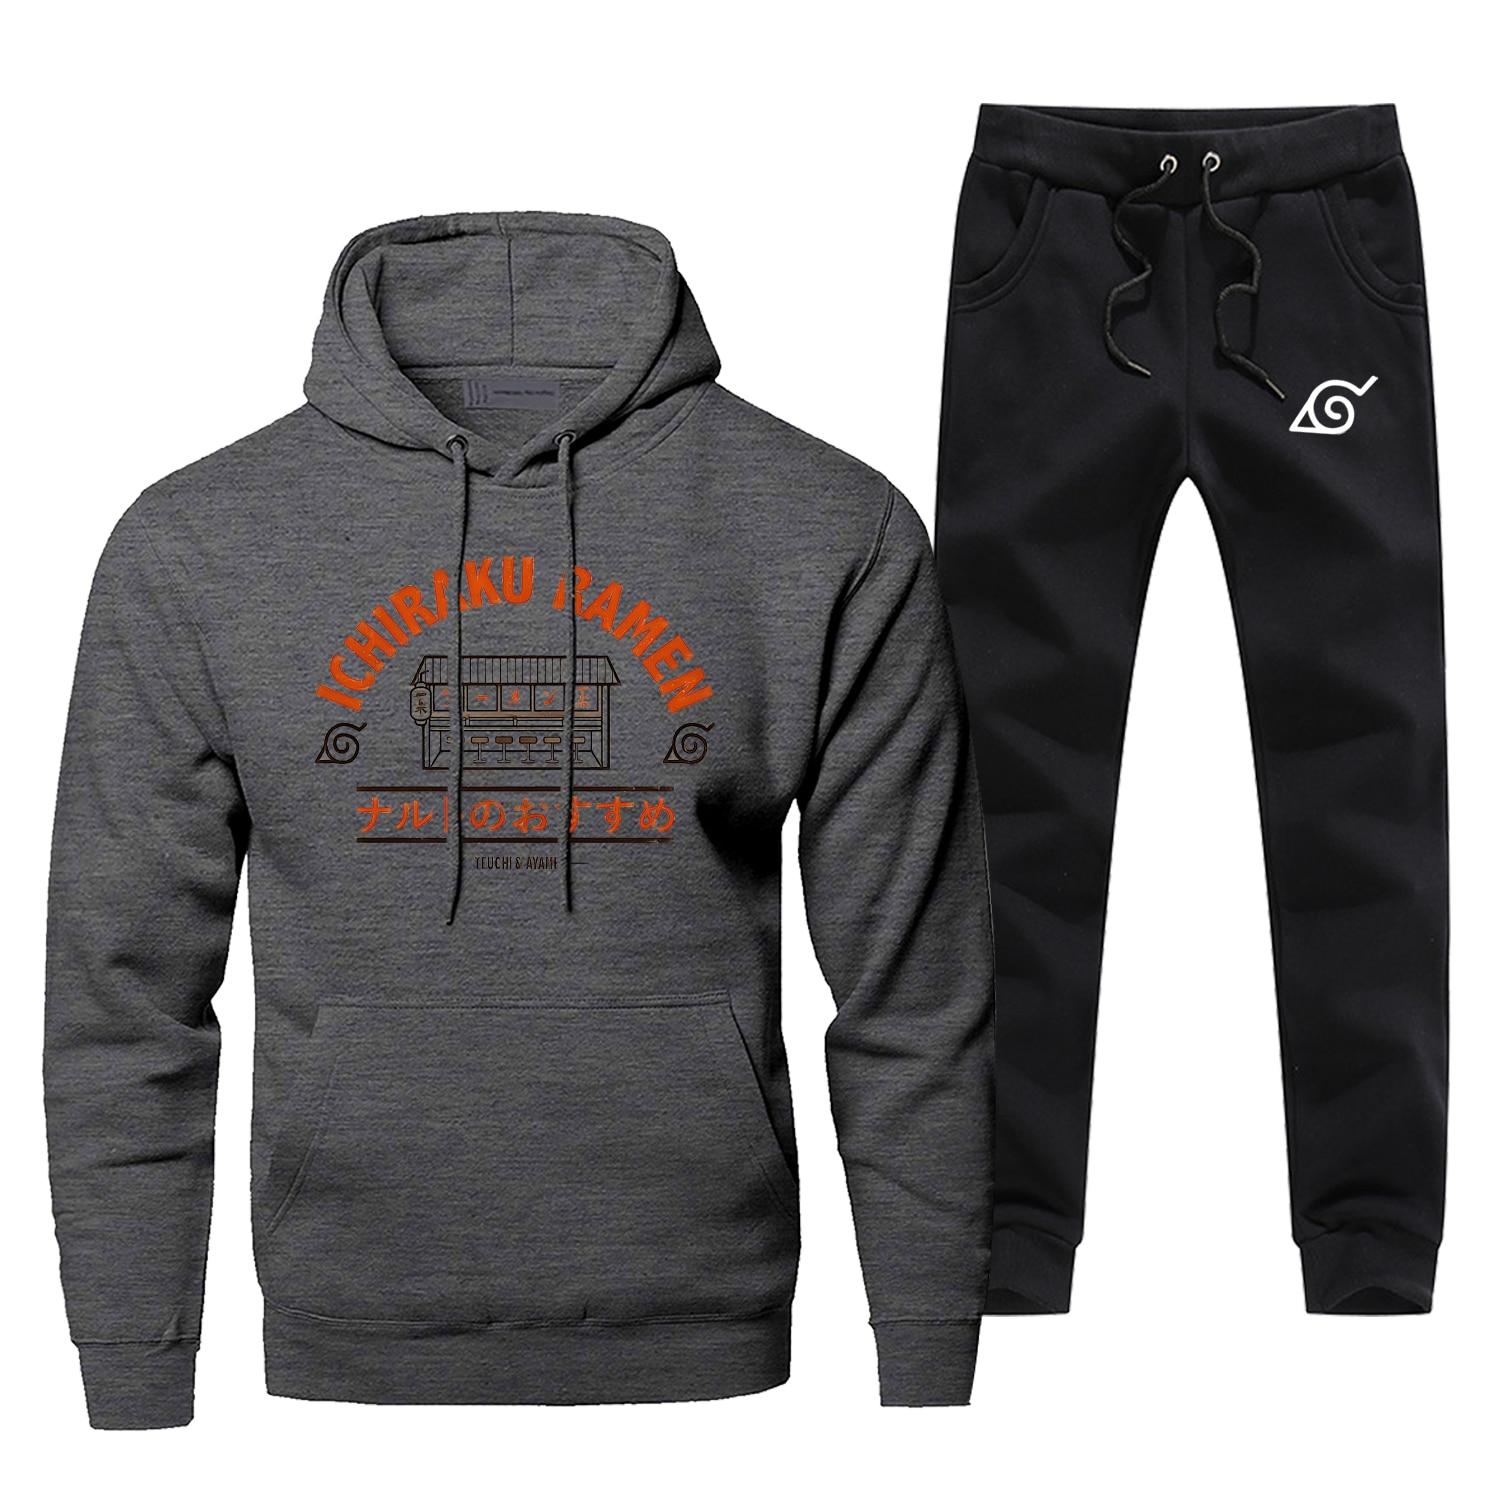 Ichiraku Ramen Naruto Men Hoodie Male Pants Set Sweatshirt Mens Hoodies Sweatshirts Sets 2Pcs Pant Pullover Japanese Anime Coat